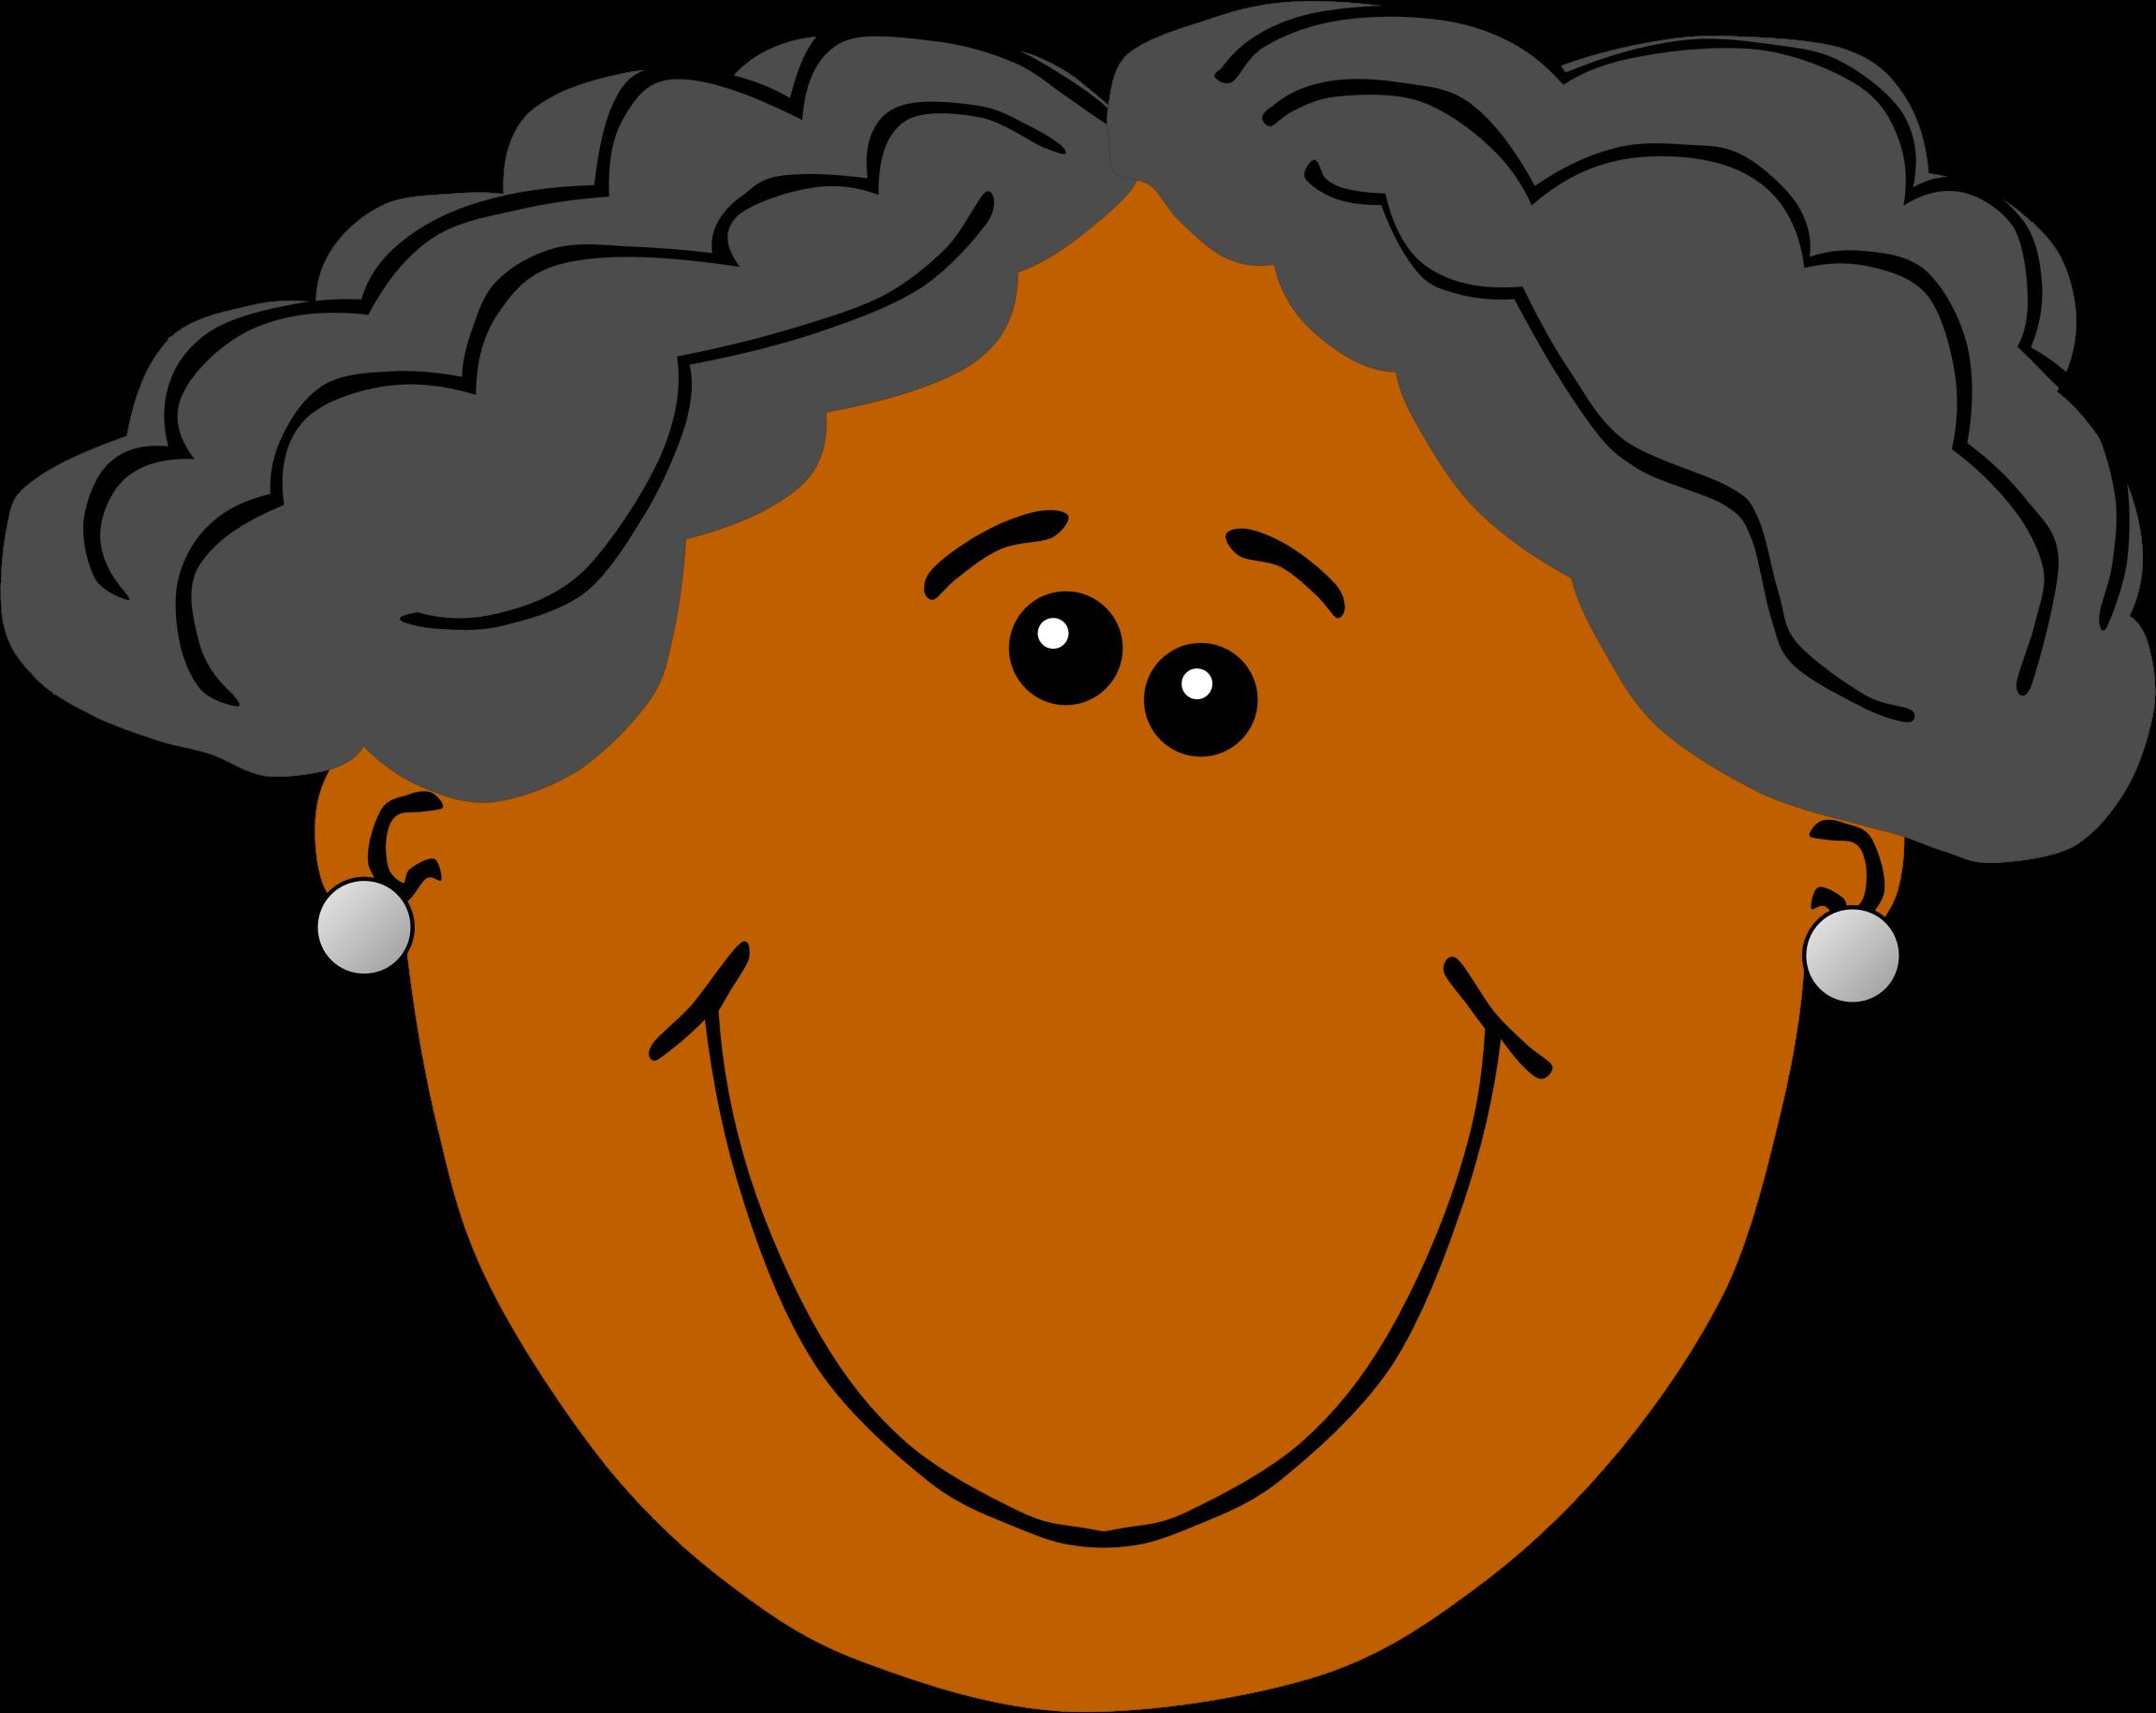 Skin clipart tan skin. Grandma with dark big